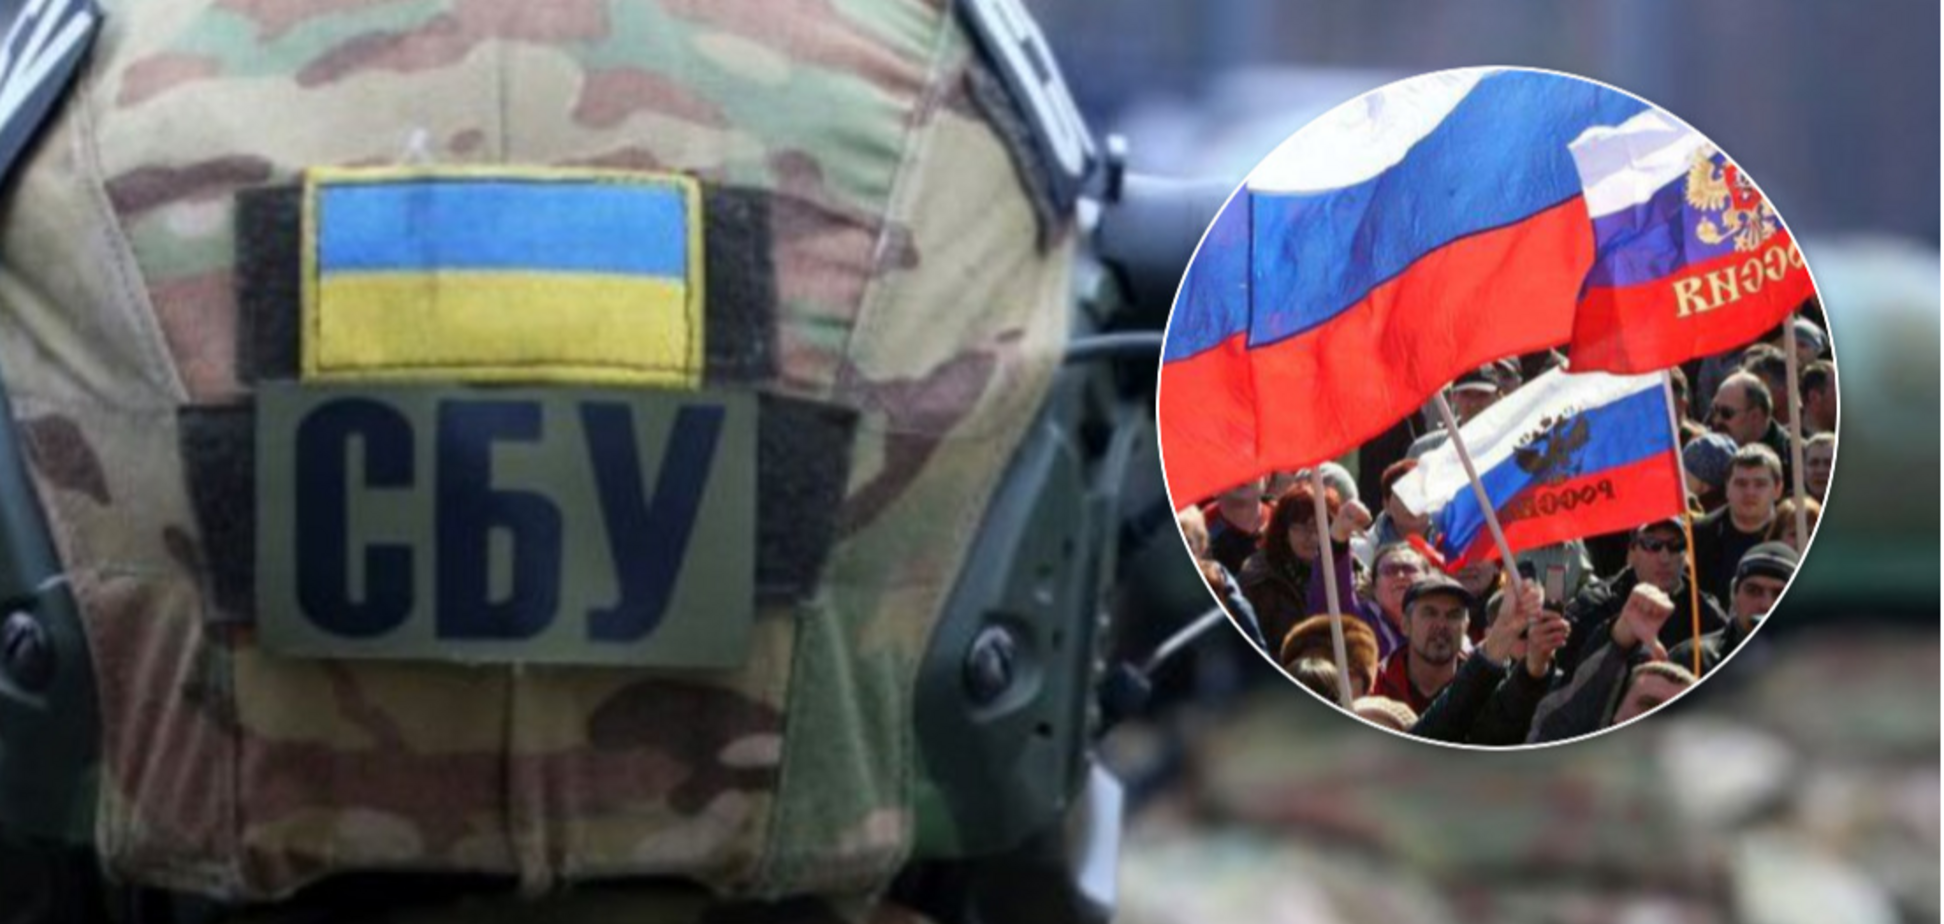 СБУ разоблачила фанаток 'русского мира'